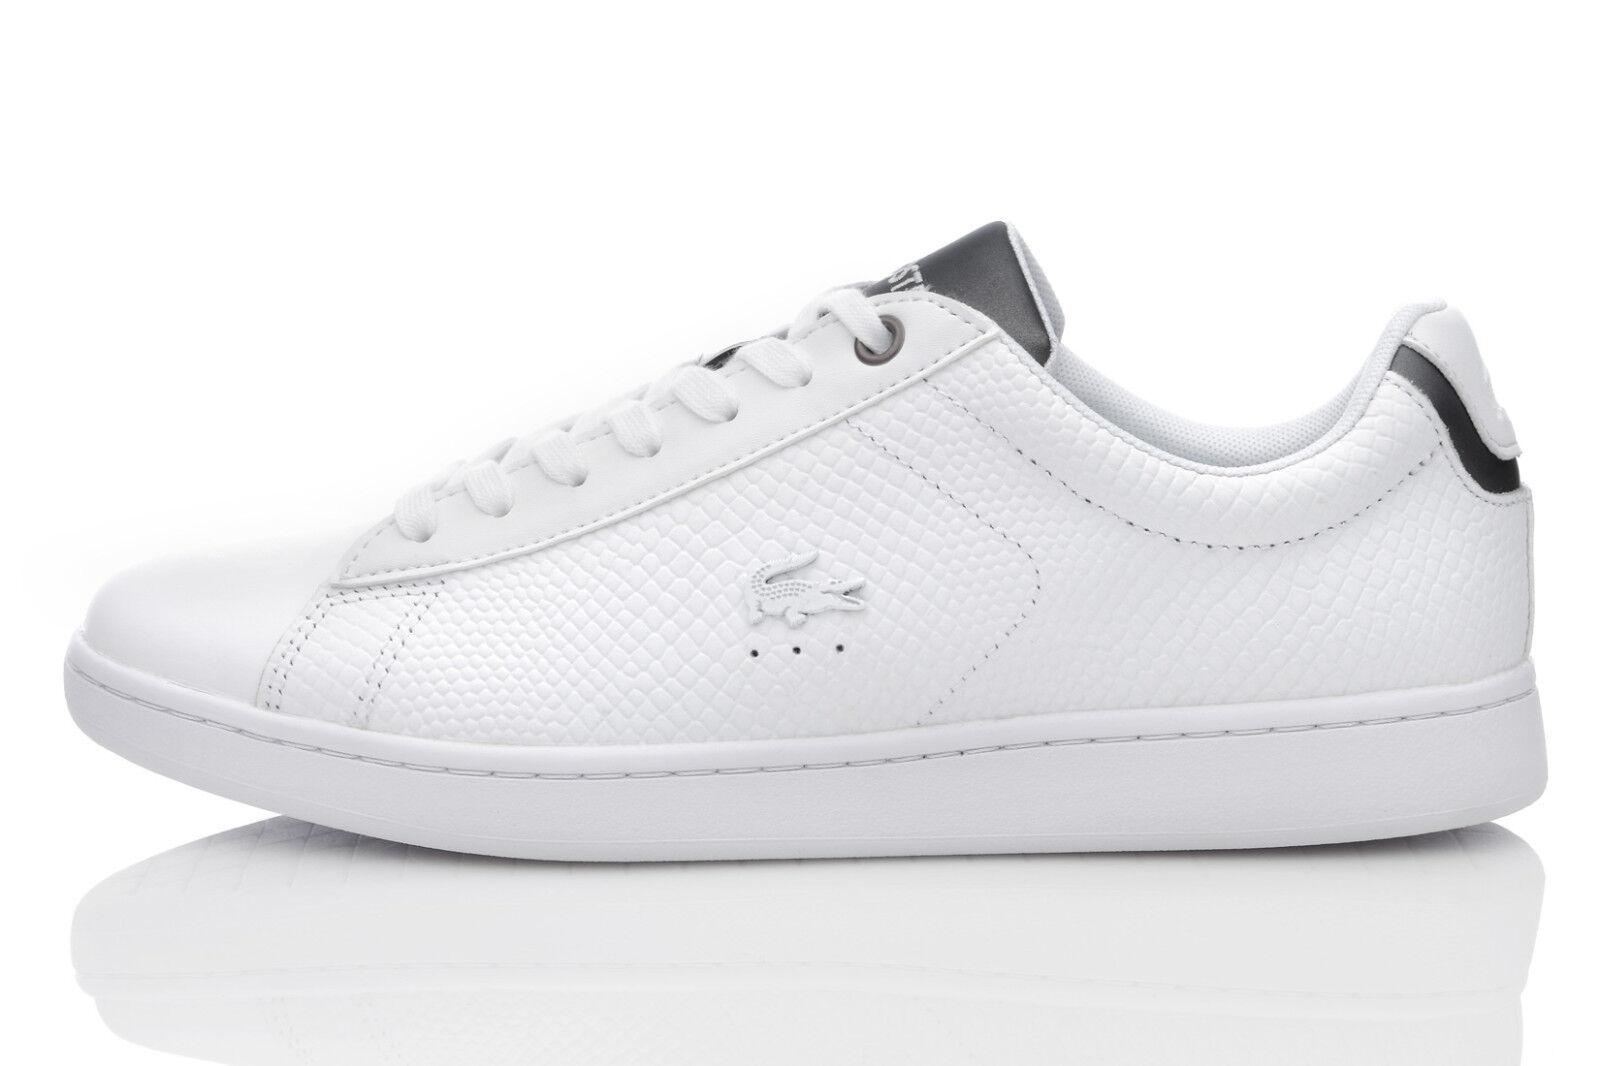 Lacoste Herren Sneaker Schuhe